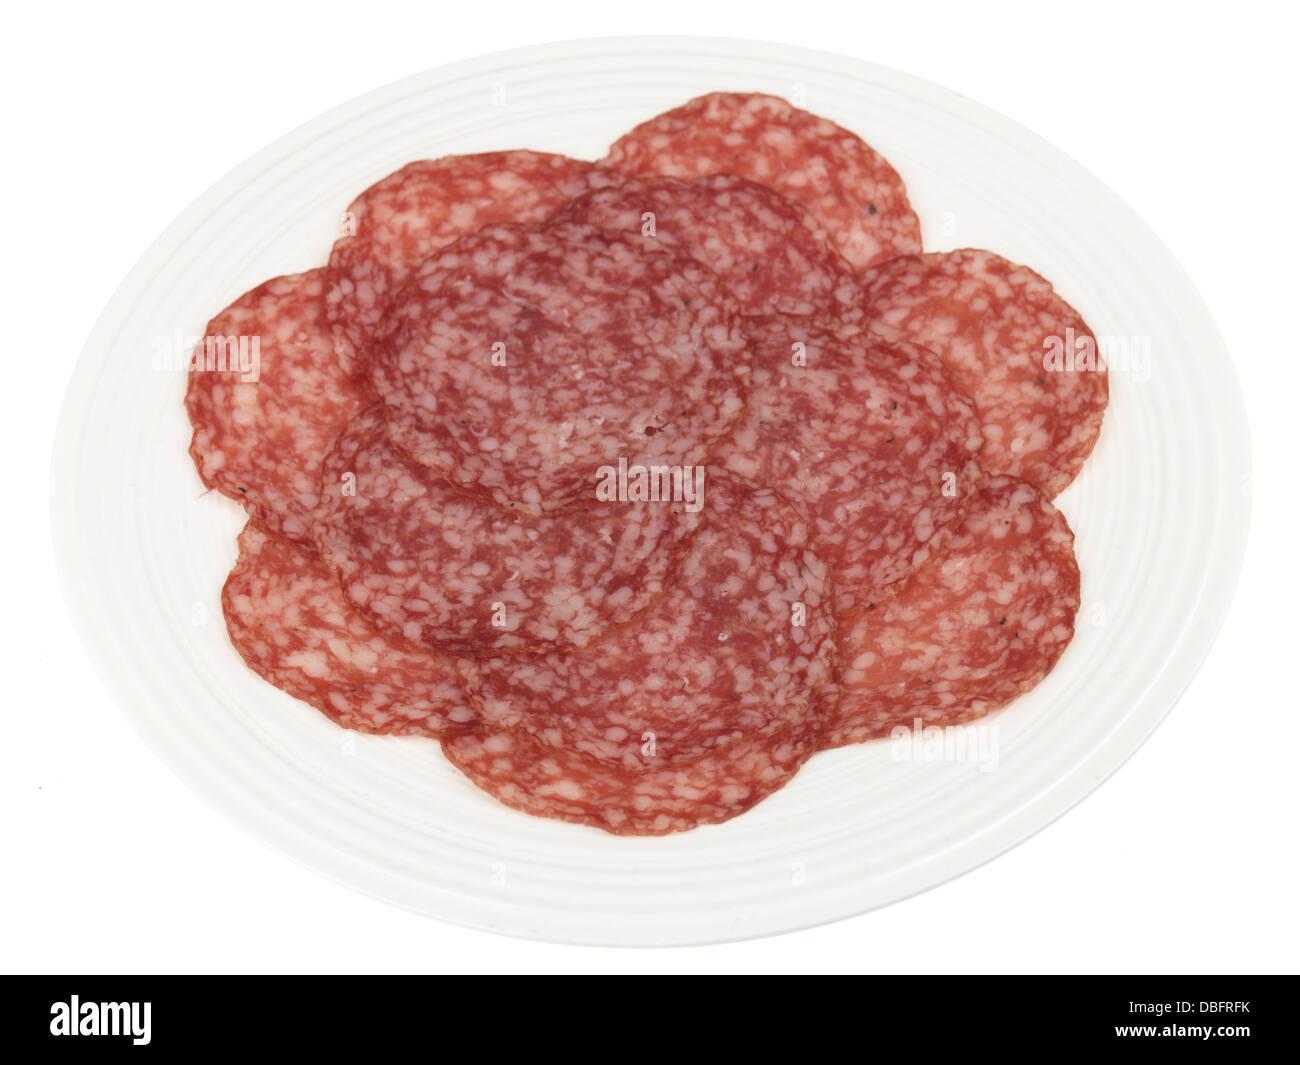 Milano Salami - Stock Image